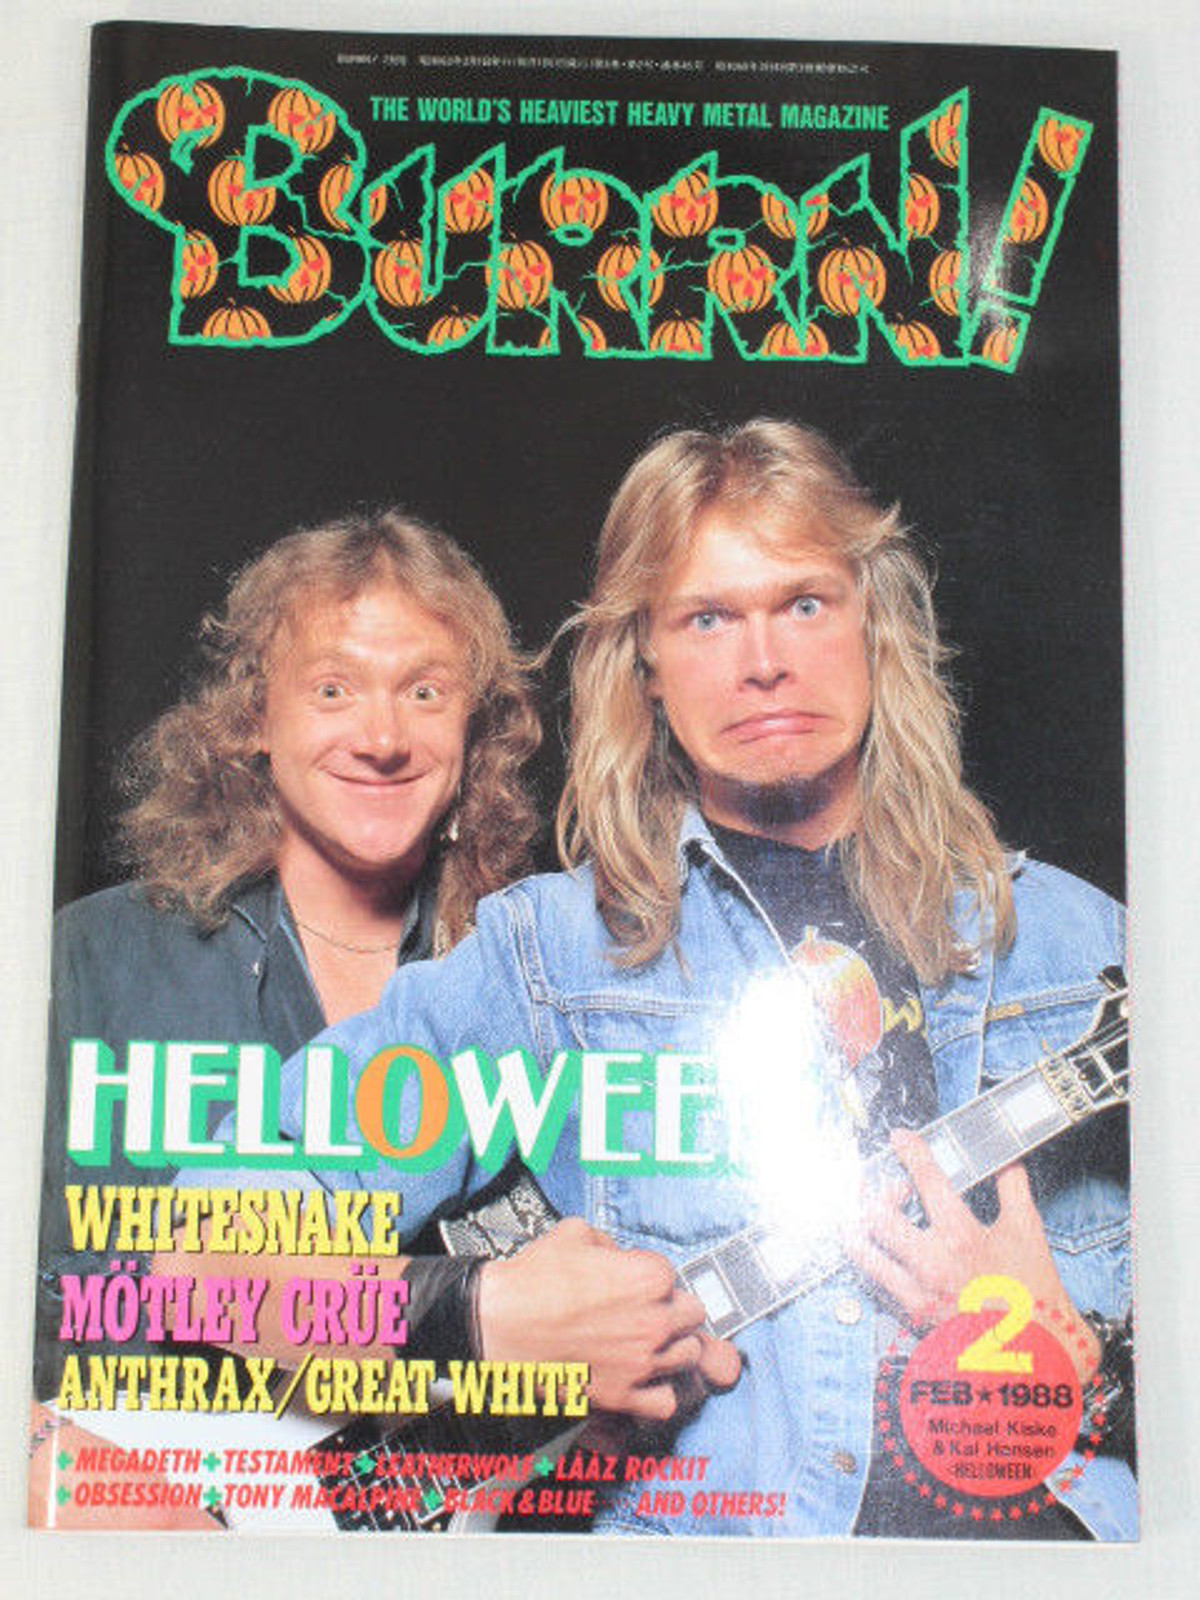 1988/02 BURRN! Japan Rock Magazine HELLOWEEN/GUNS N' ROSES/ANTHRAX/TESTAMENT